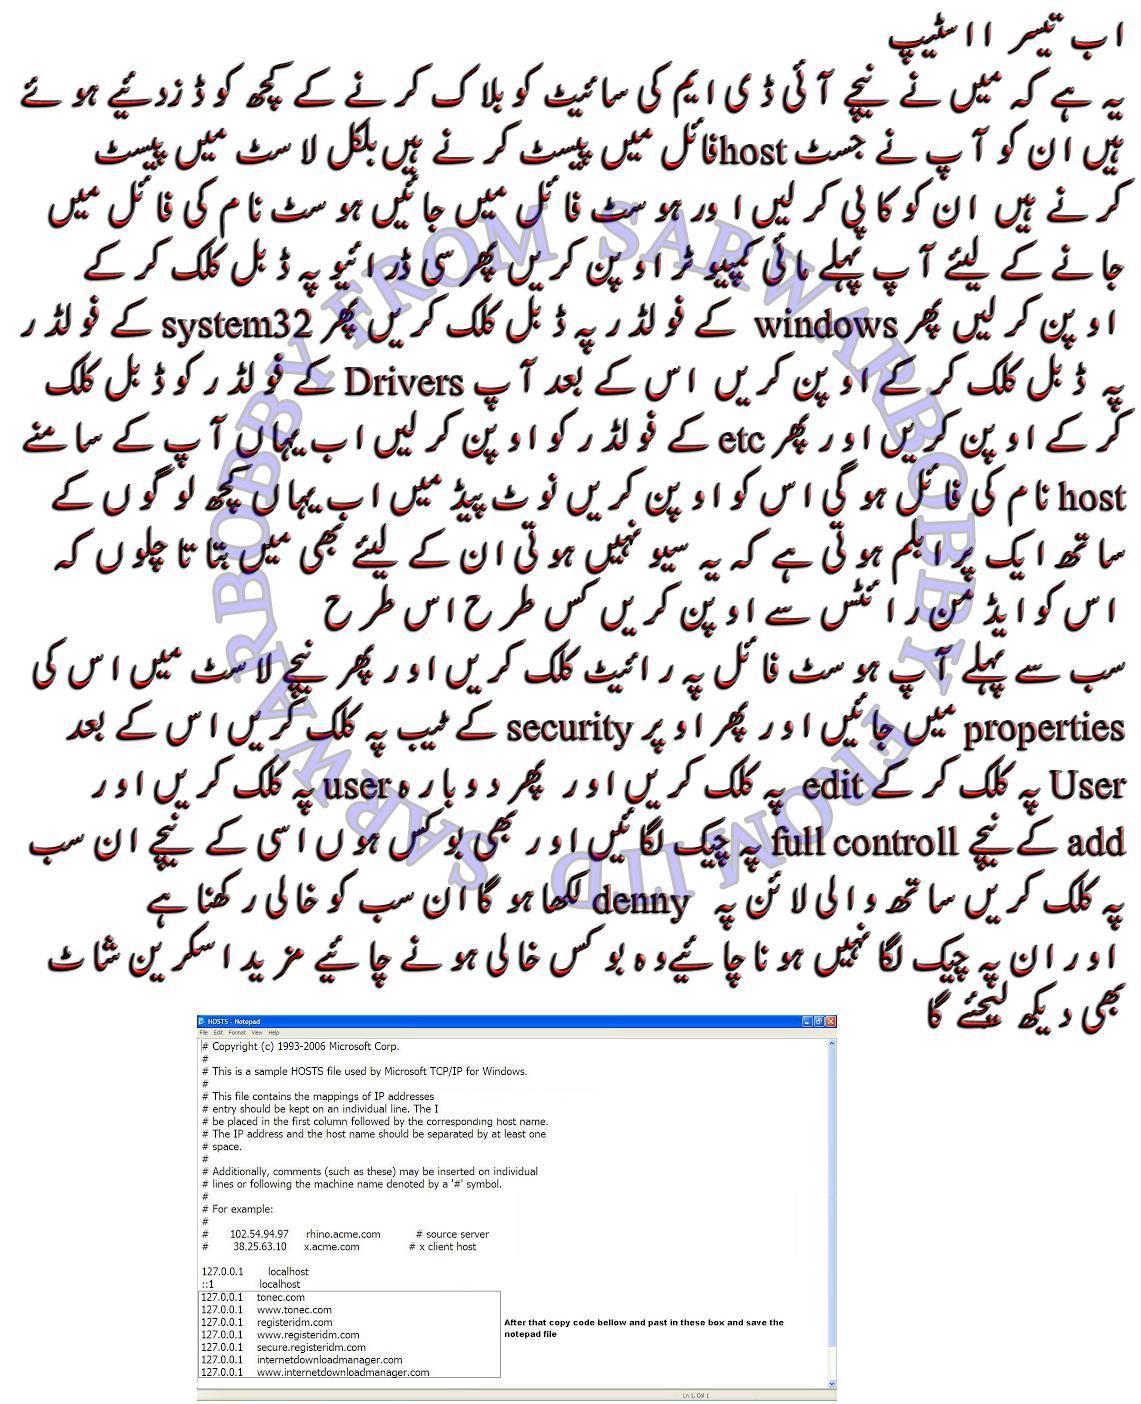 cmd tricks and hacks internet pdf